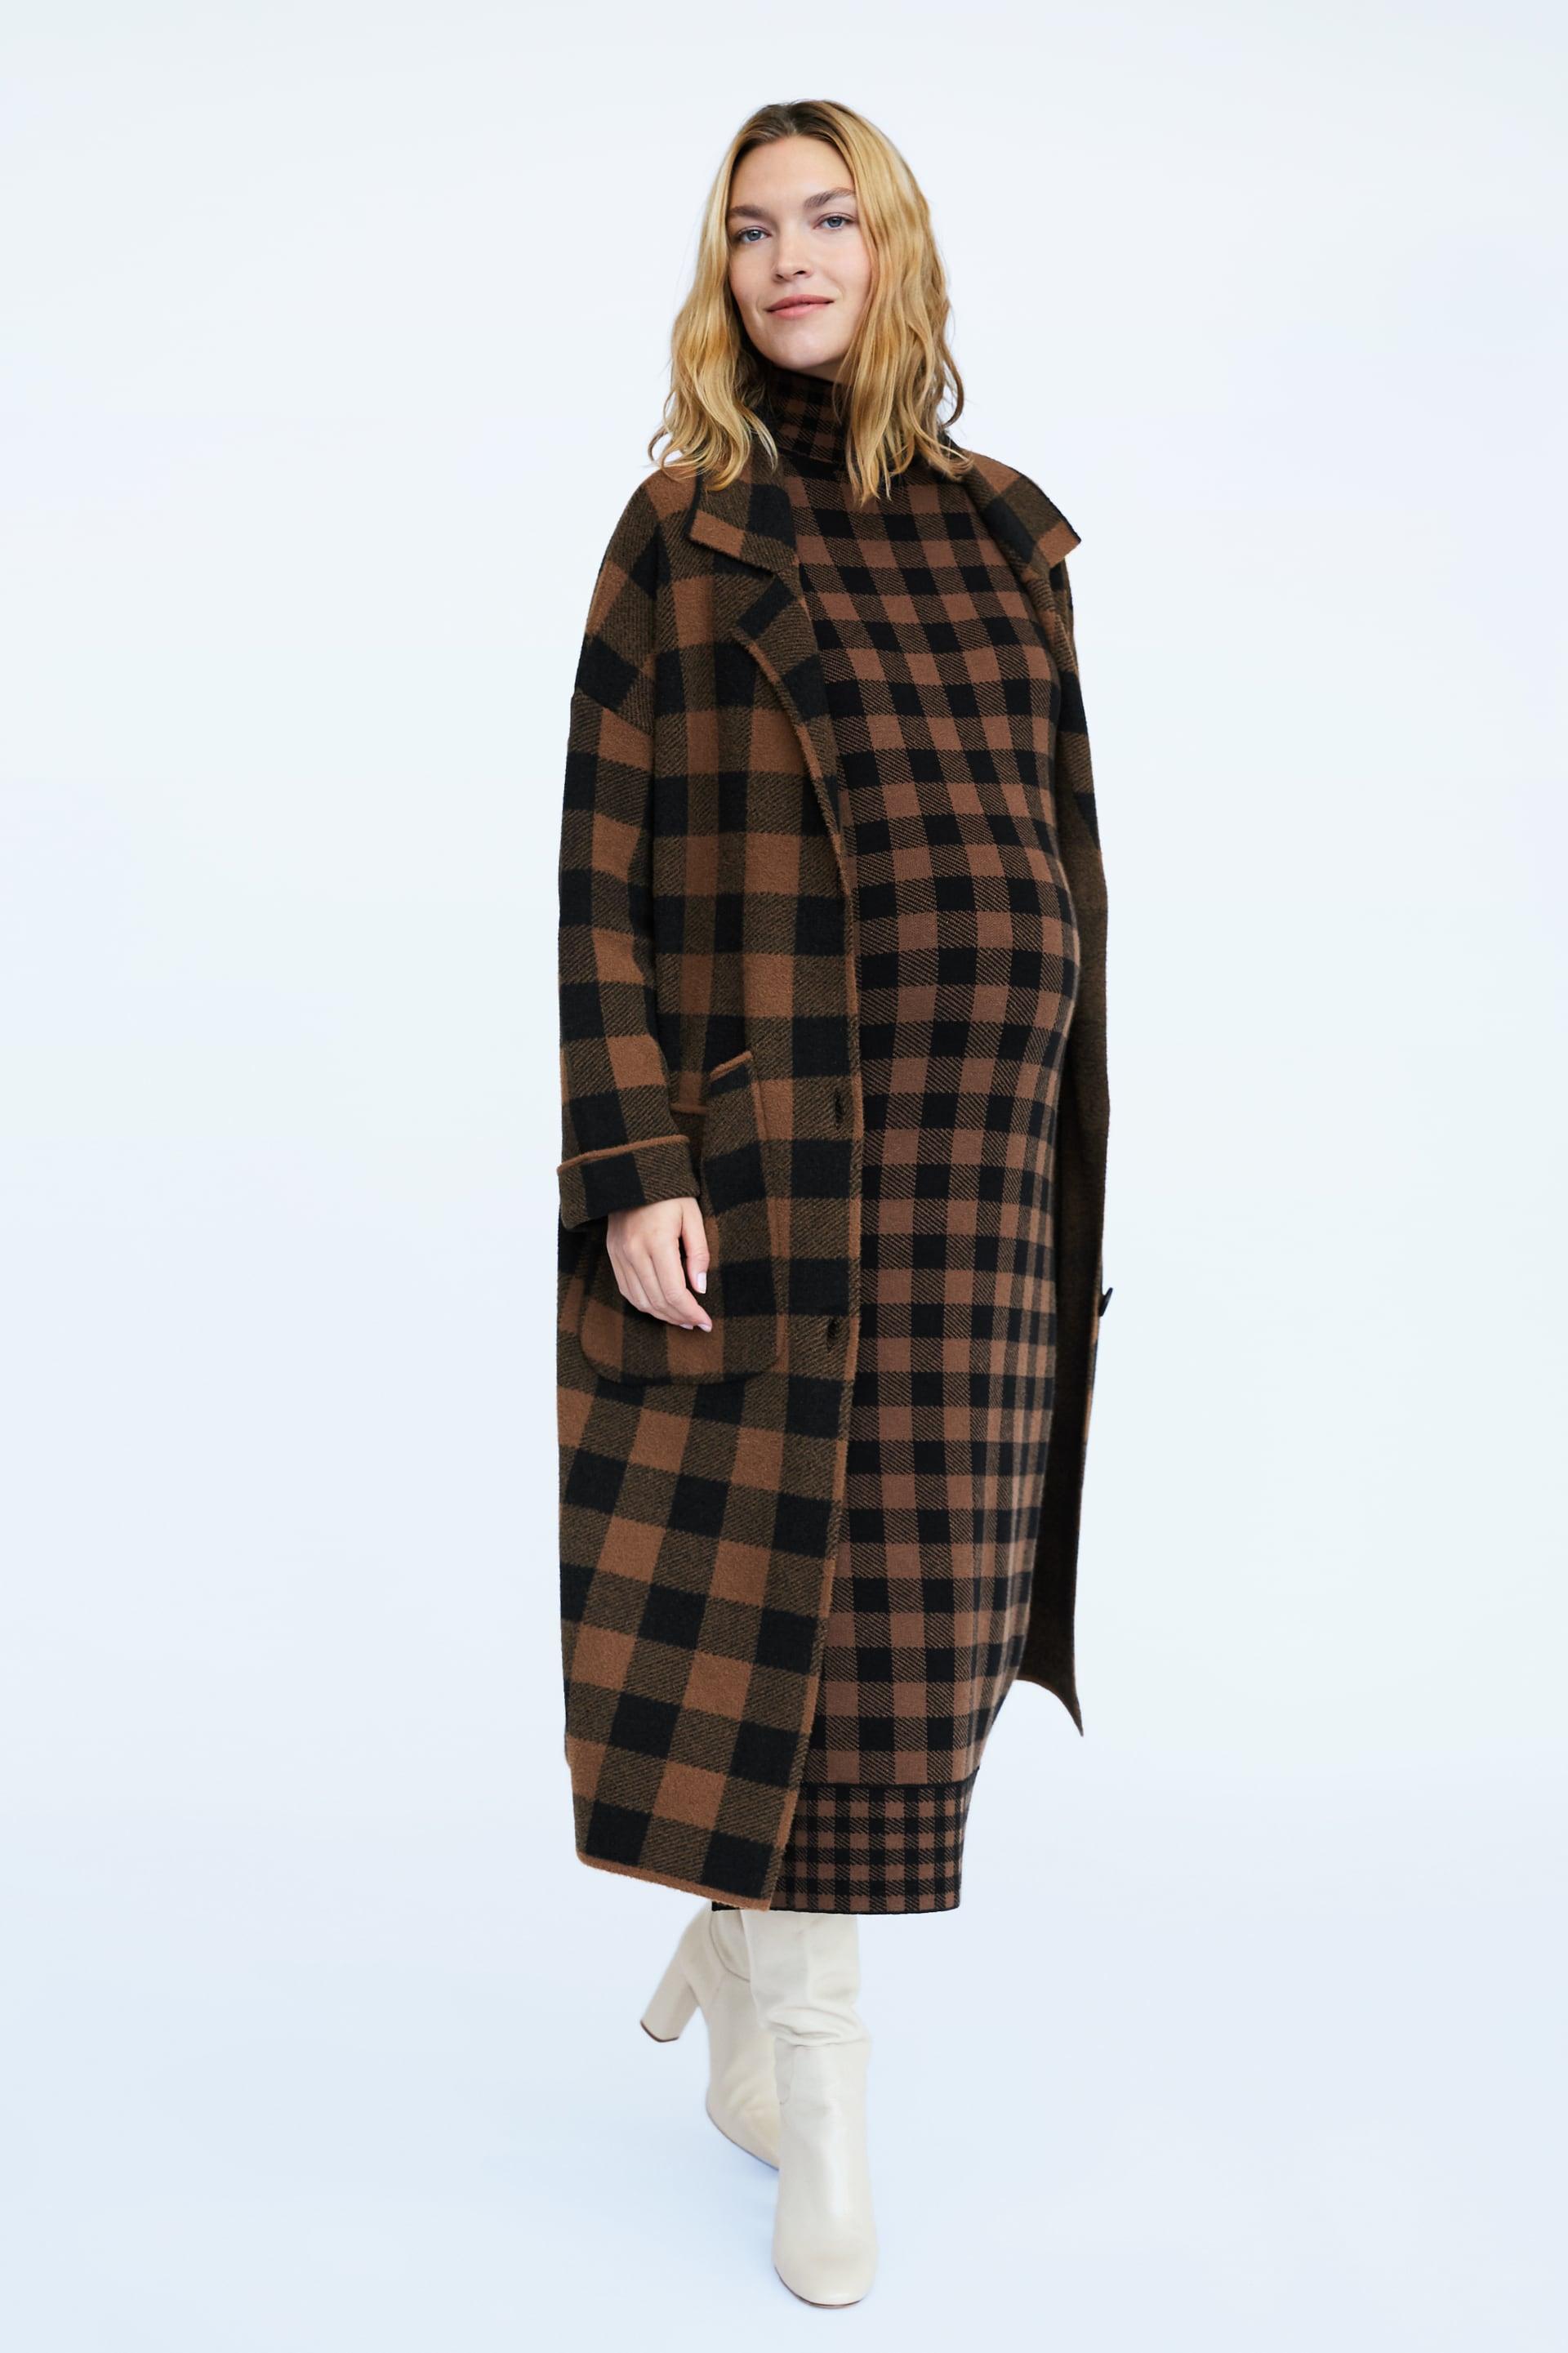 cf655da7 New Zara Maternity Clothing Line, Meghan Markle Style